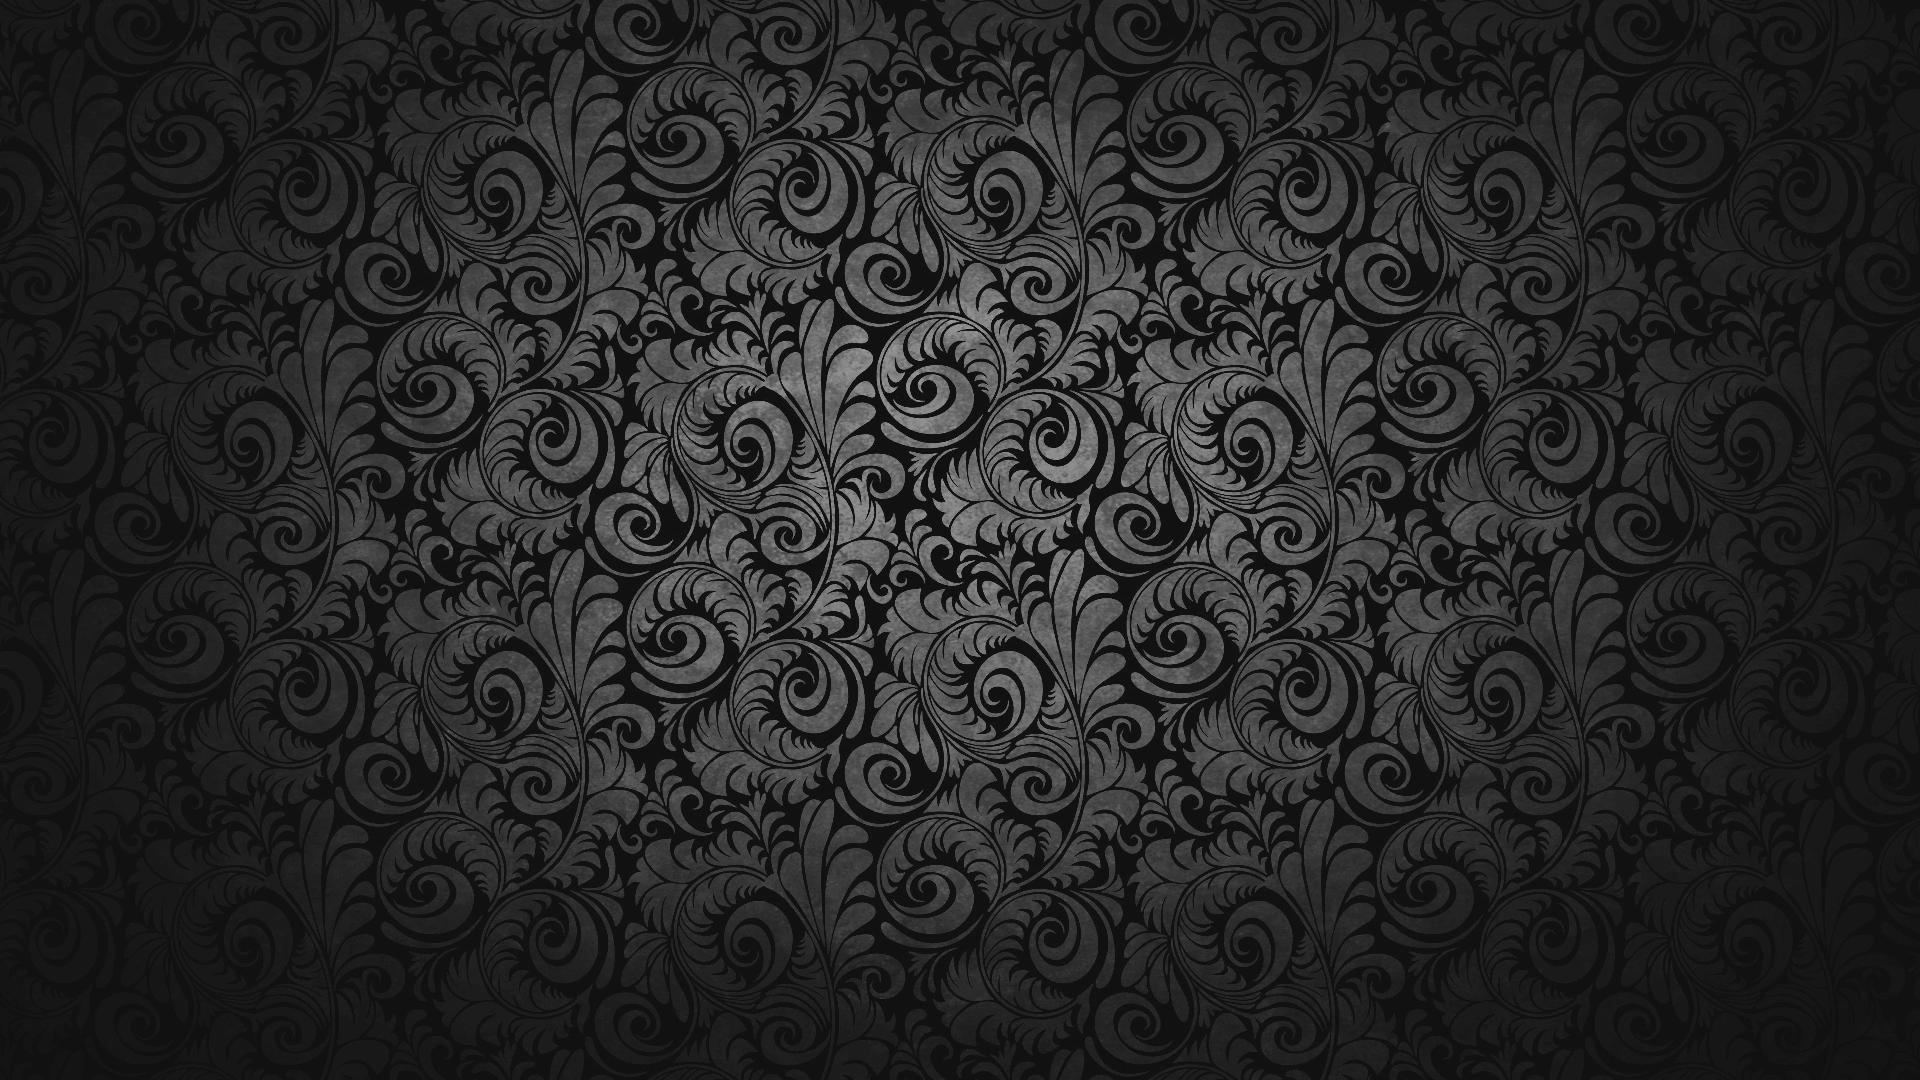 Autumn Fall Wallpaper Free Black Paisley Hd Wallpapers Pixelstalk Net